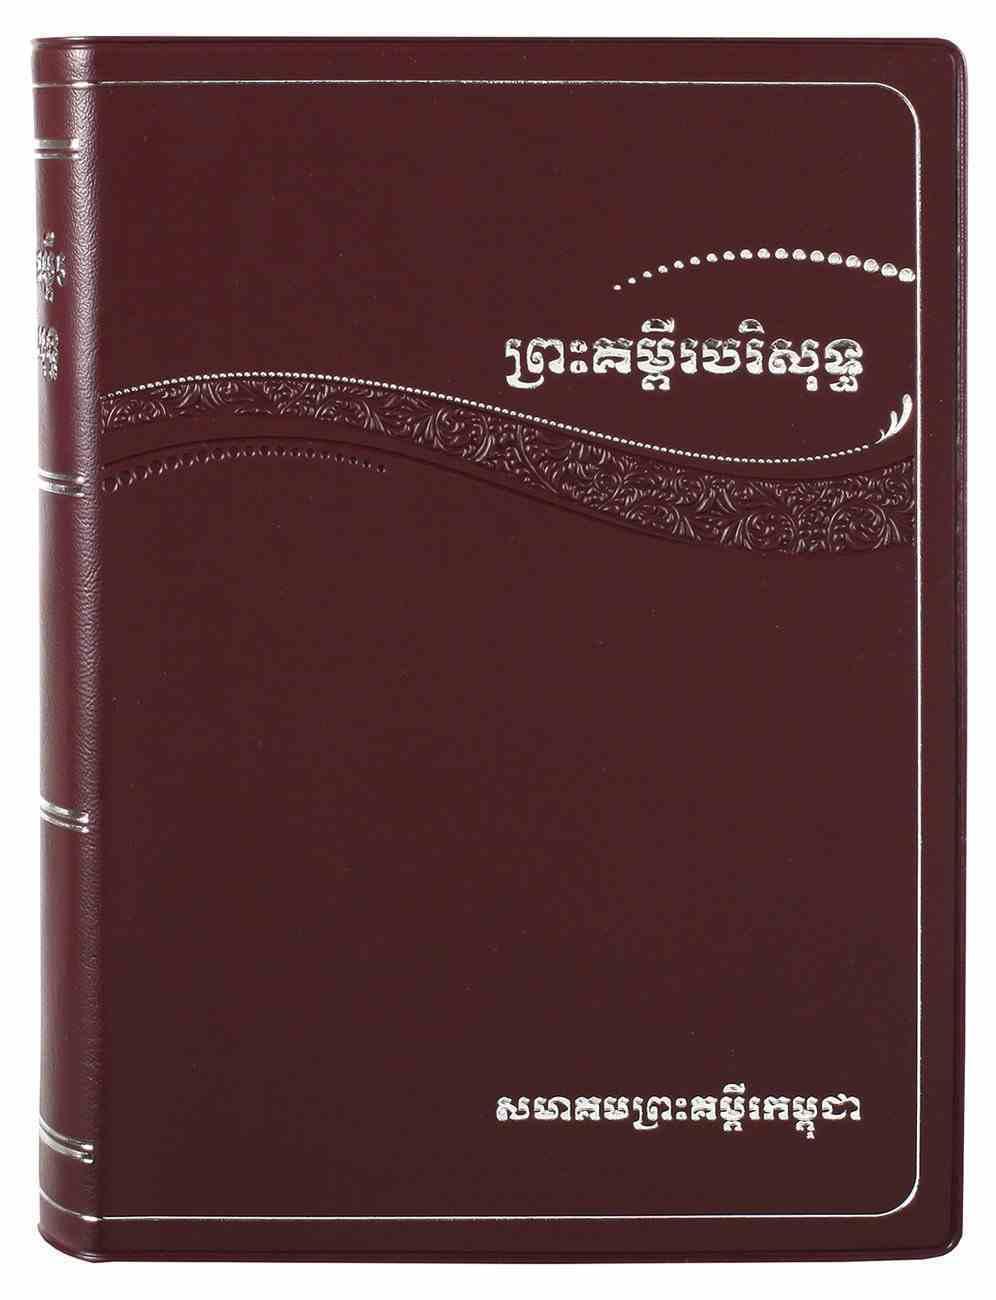 Cambodian Khmer Bible Imitation Leather